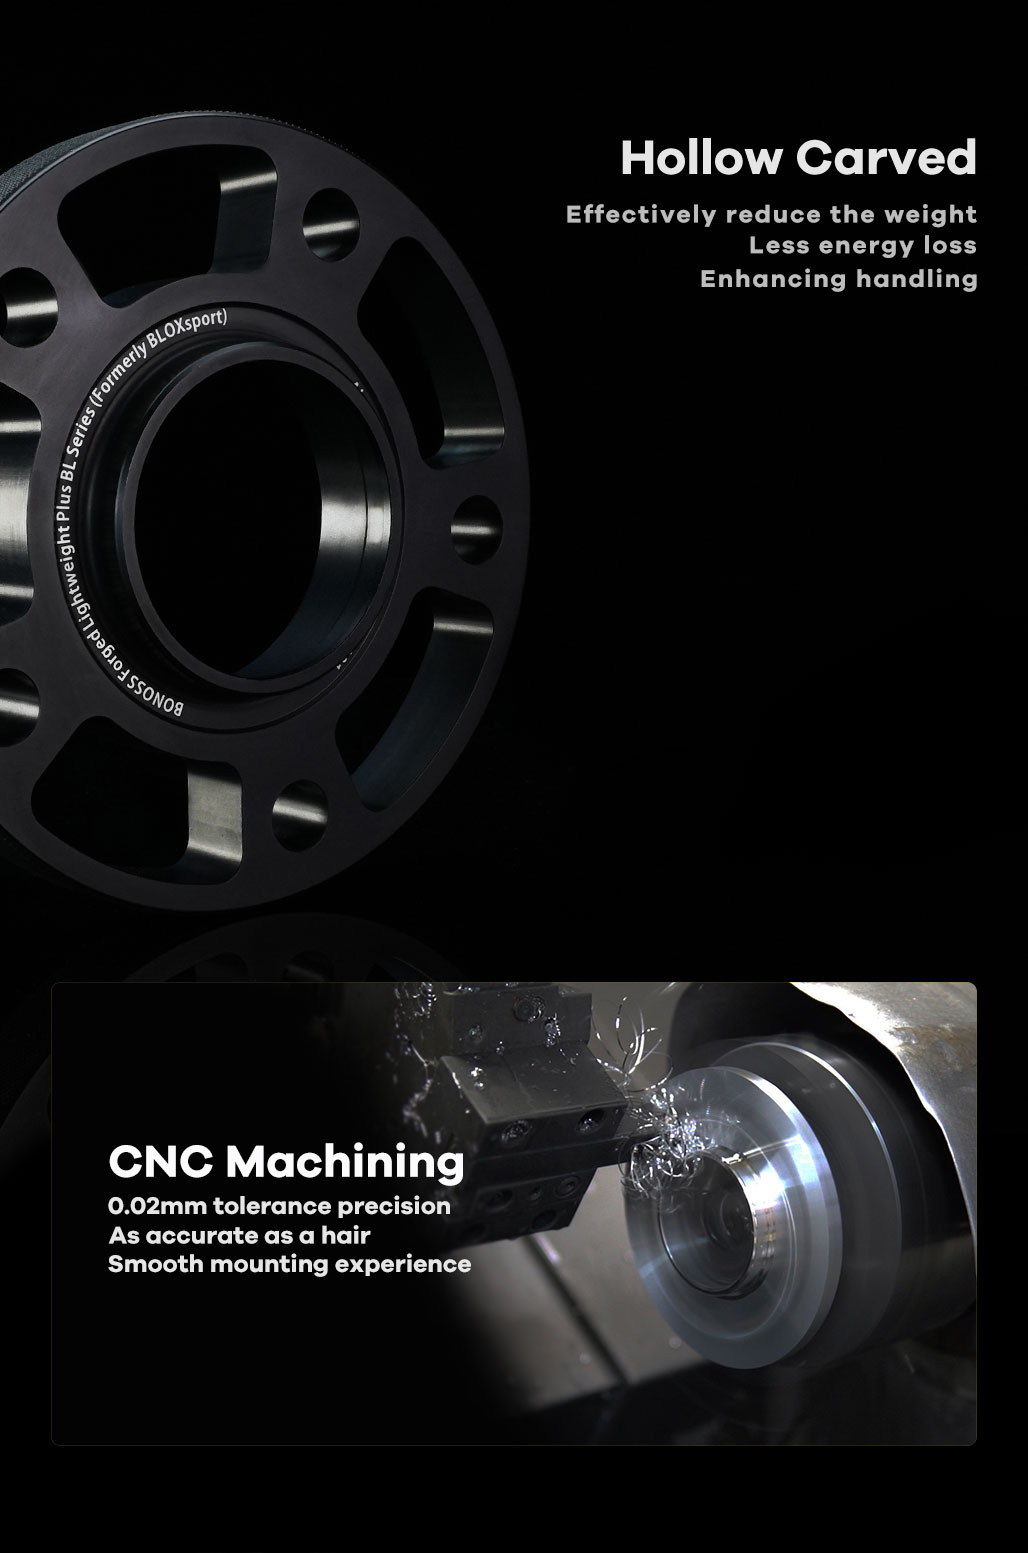 BONOSS-forged-lightweight-plus-wheel-spacer-for-Opel-Vivaro-A-5x118-71-14x1.5-6061t6-by-grace-4